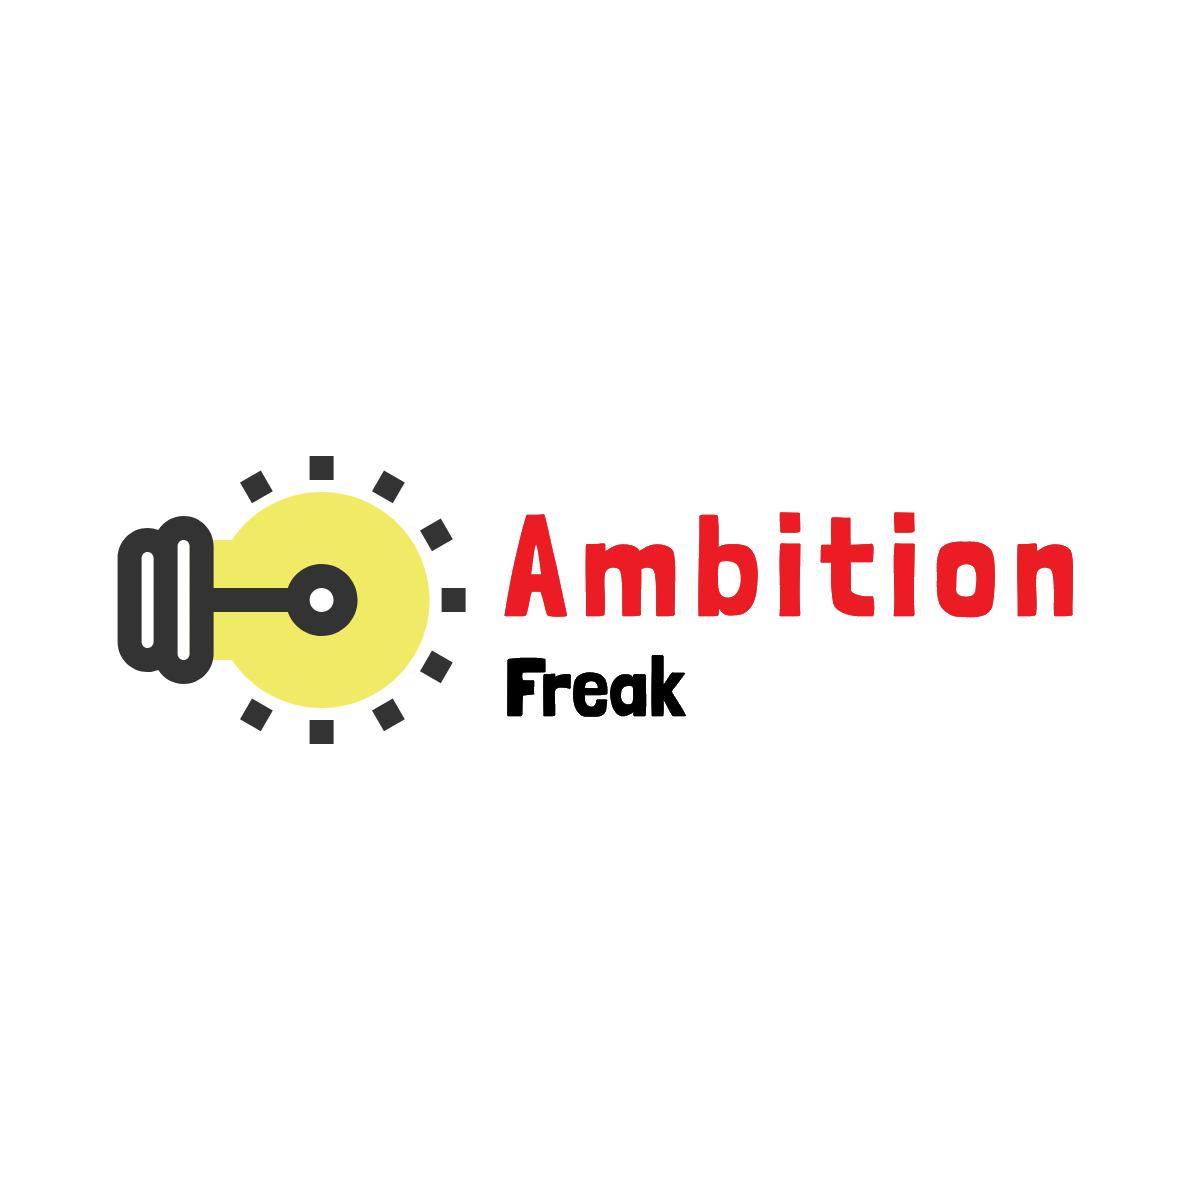 Ambition Freak